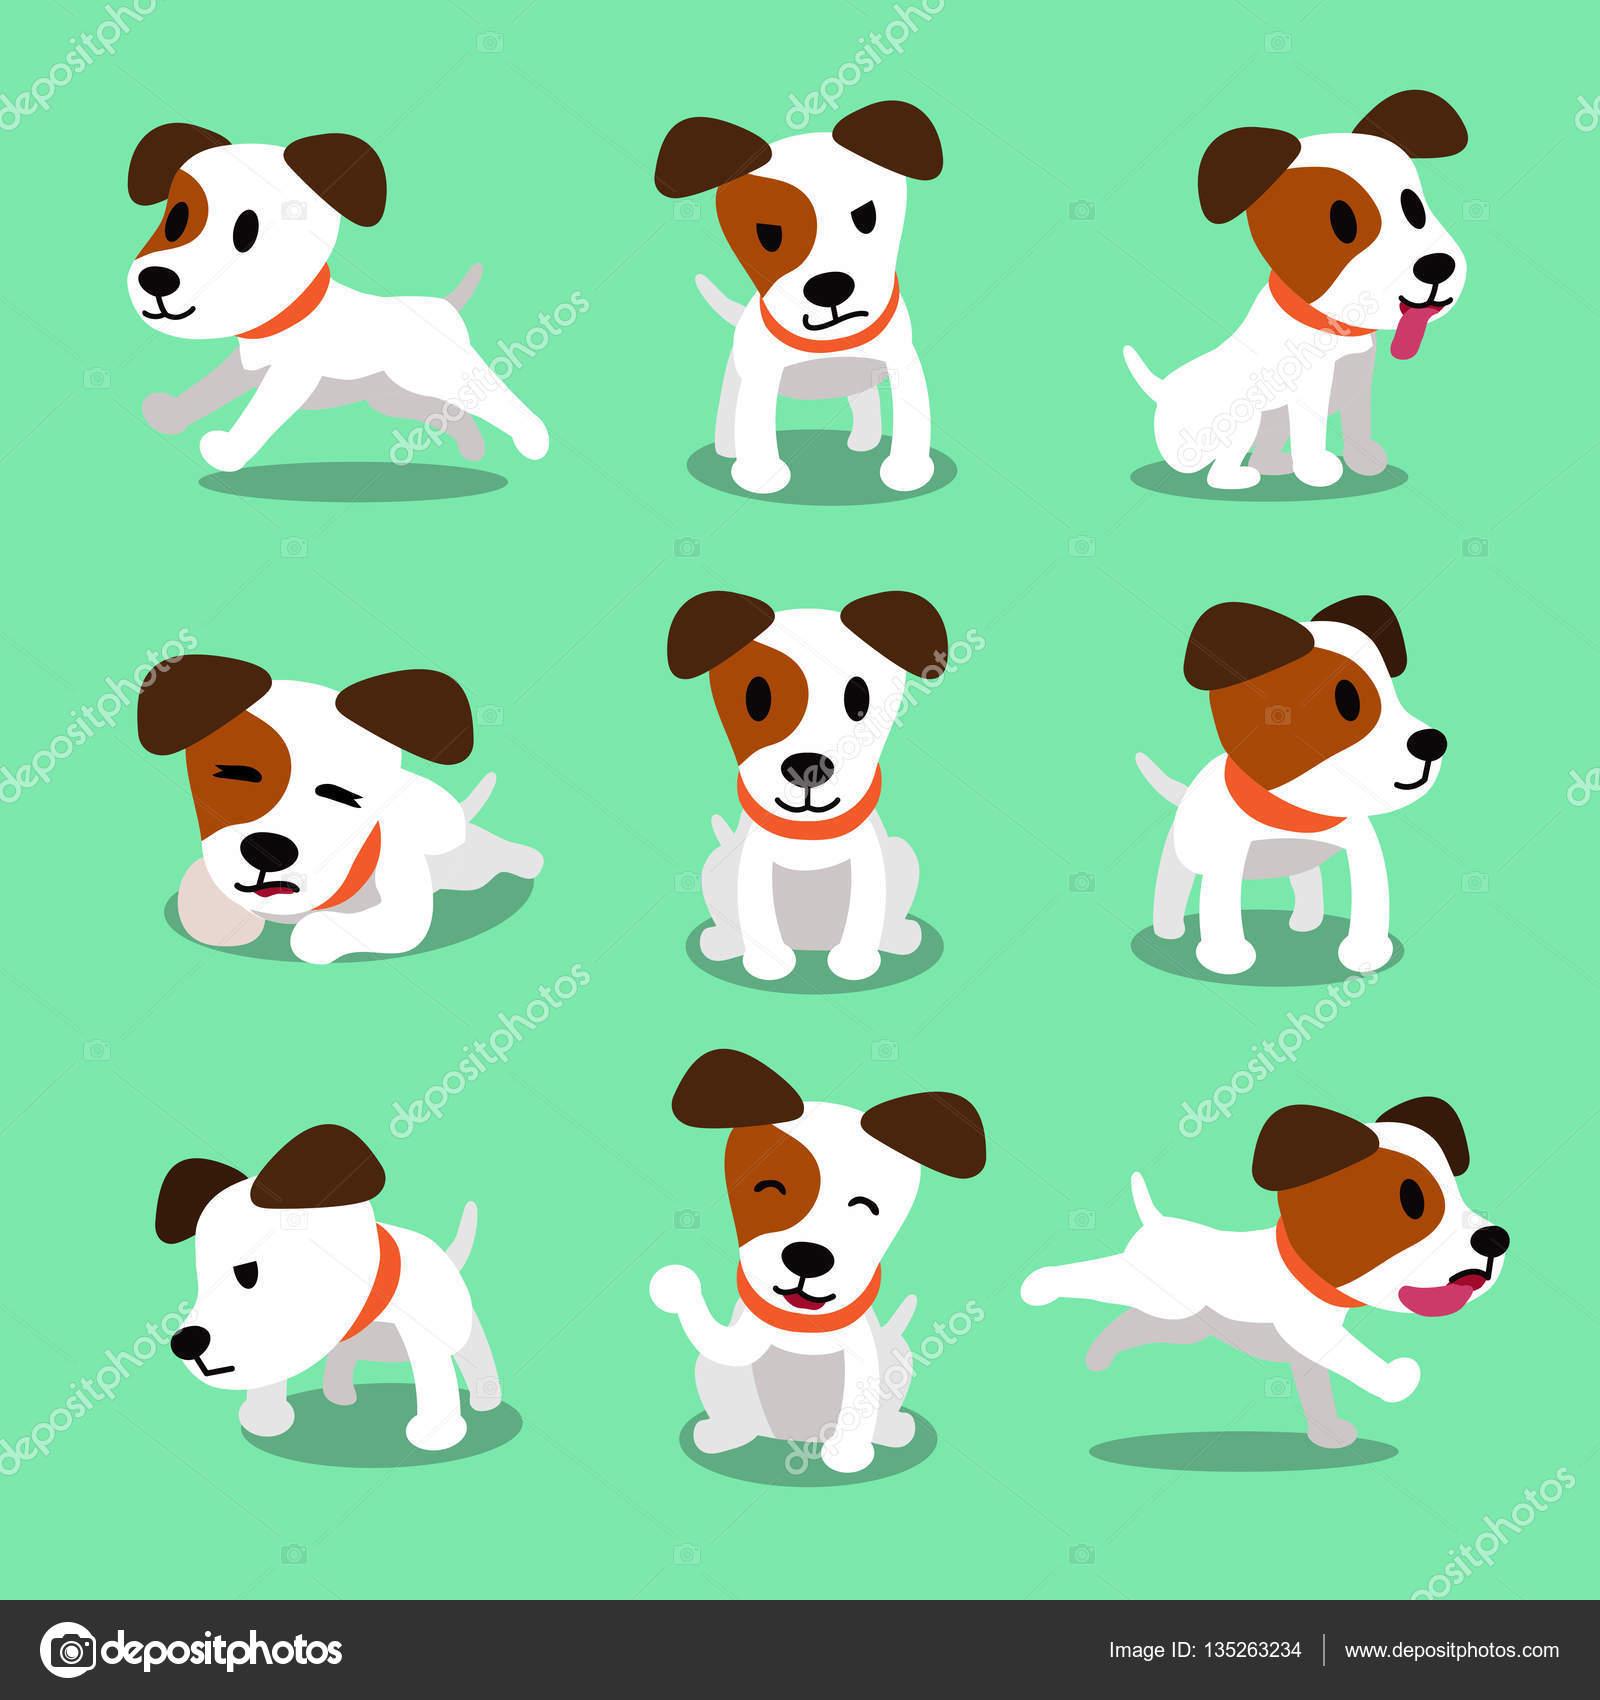 Personaje de dibujos animados jack russell terrier perro